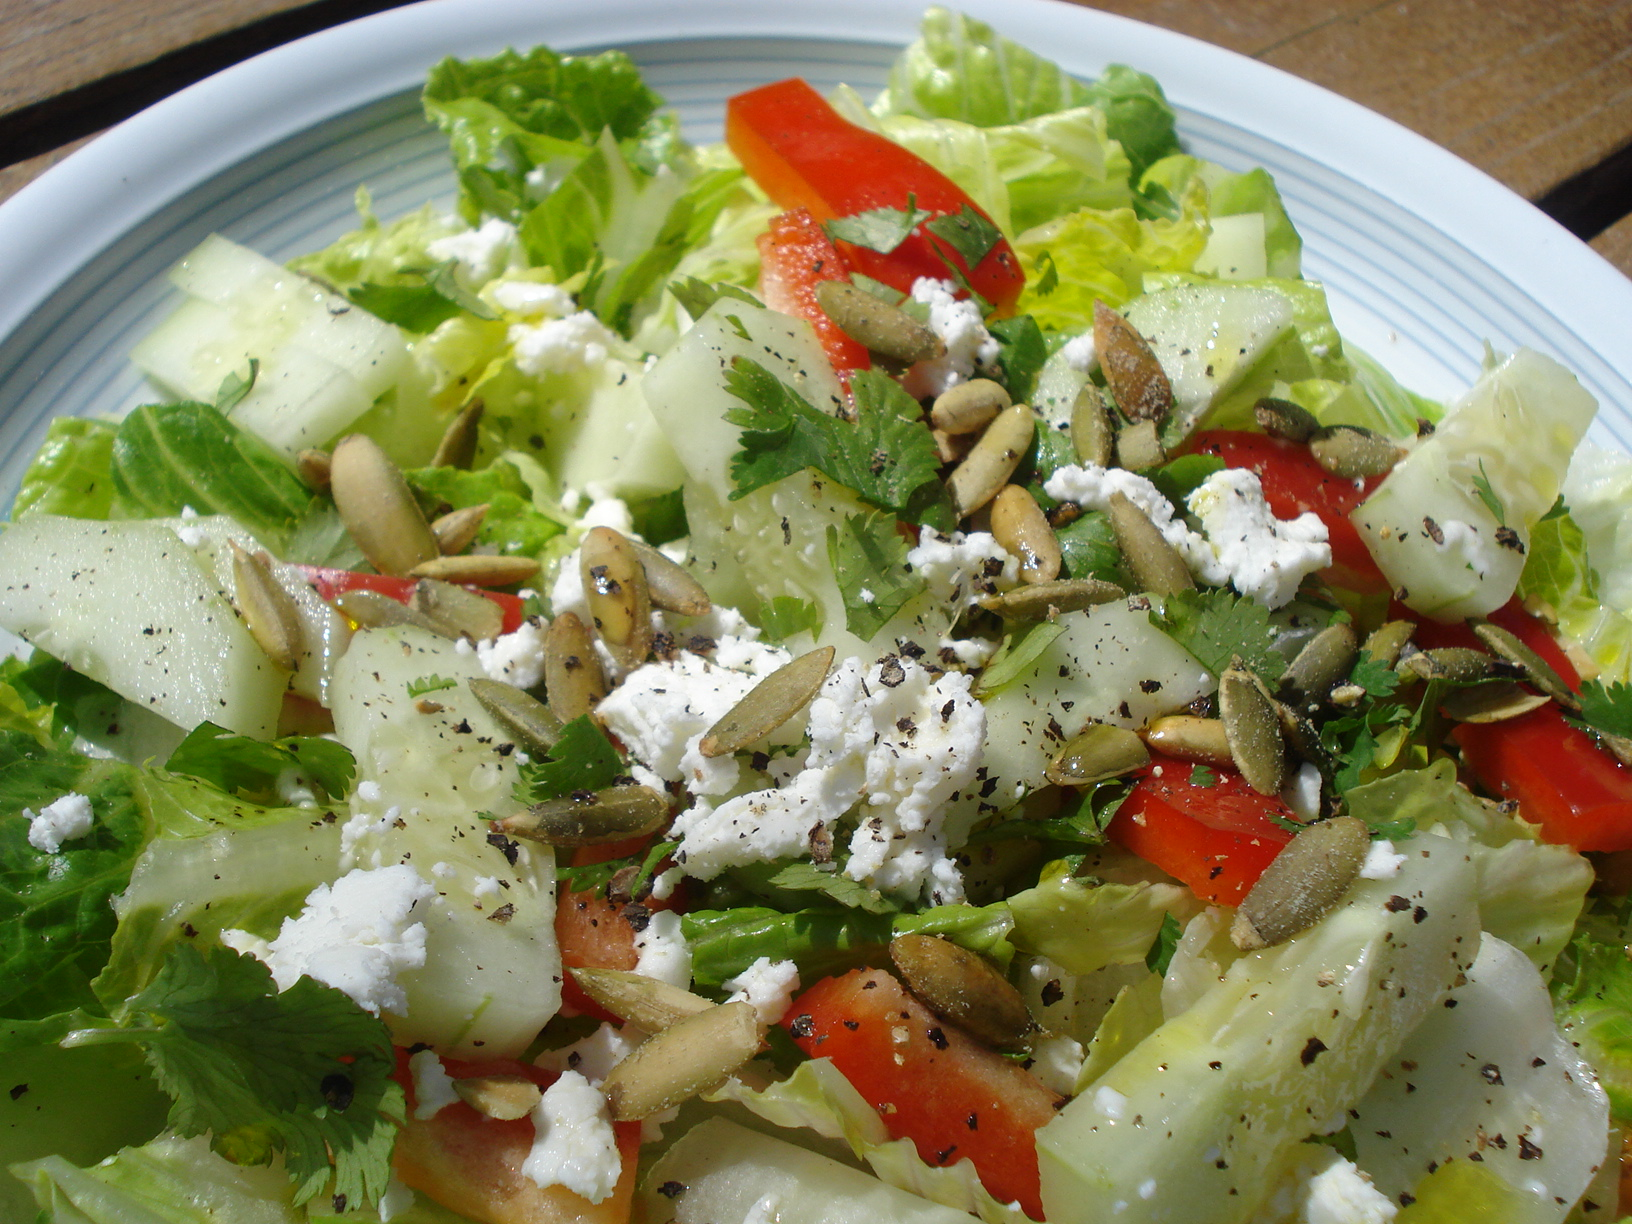 03-19-09-salad004